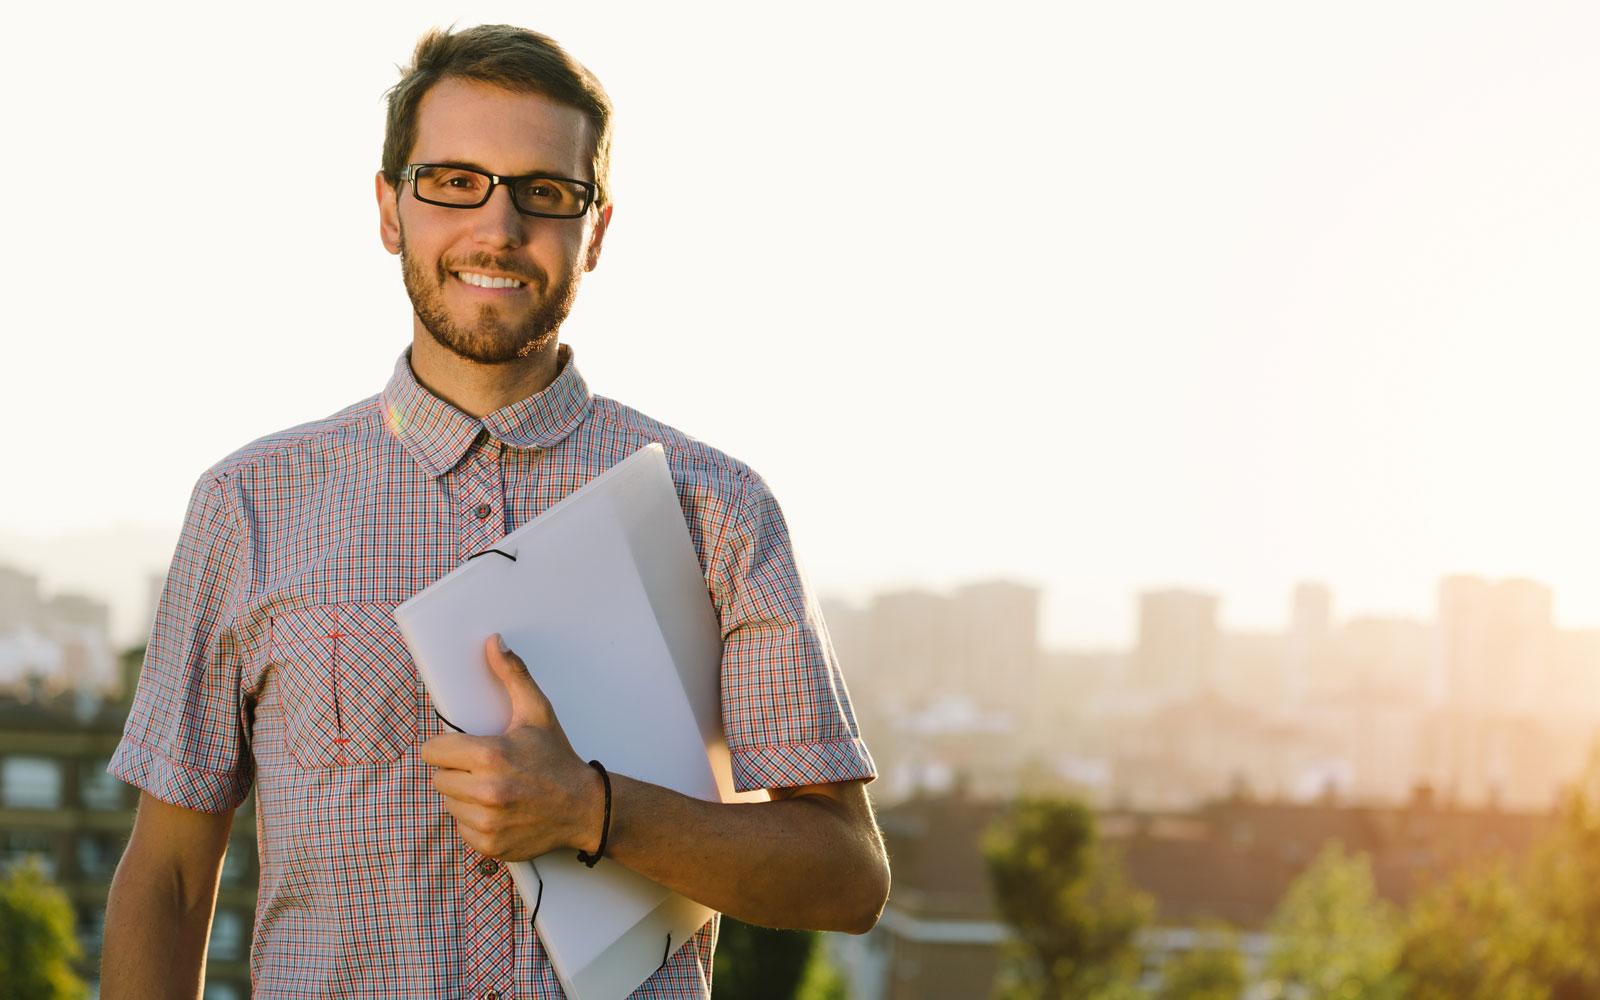 Man holding a laptop smiling